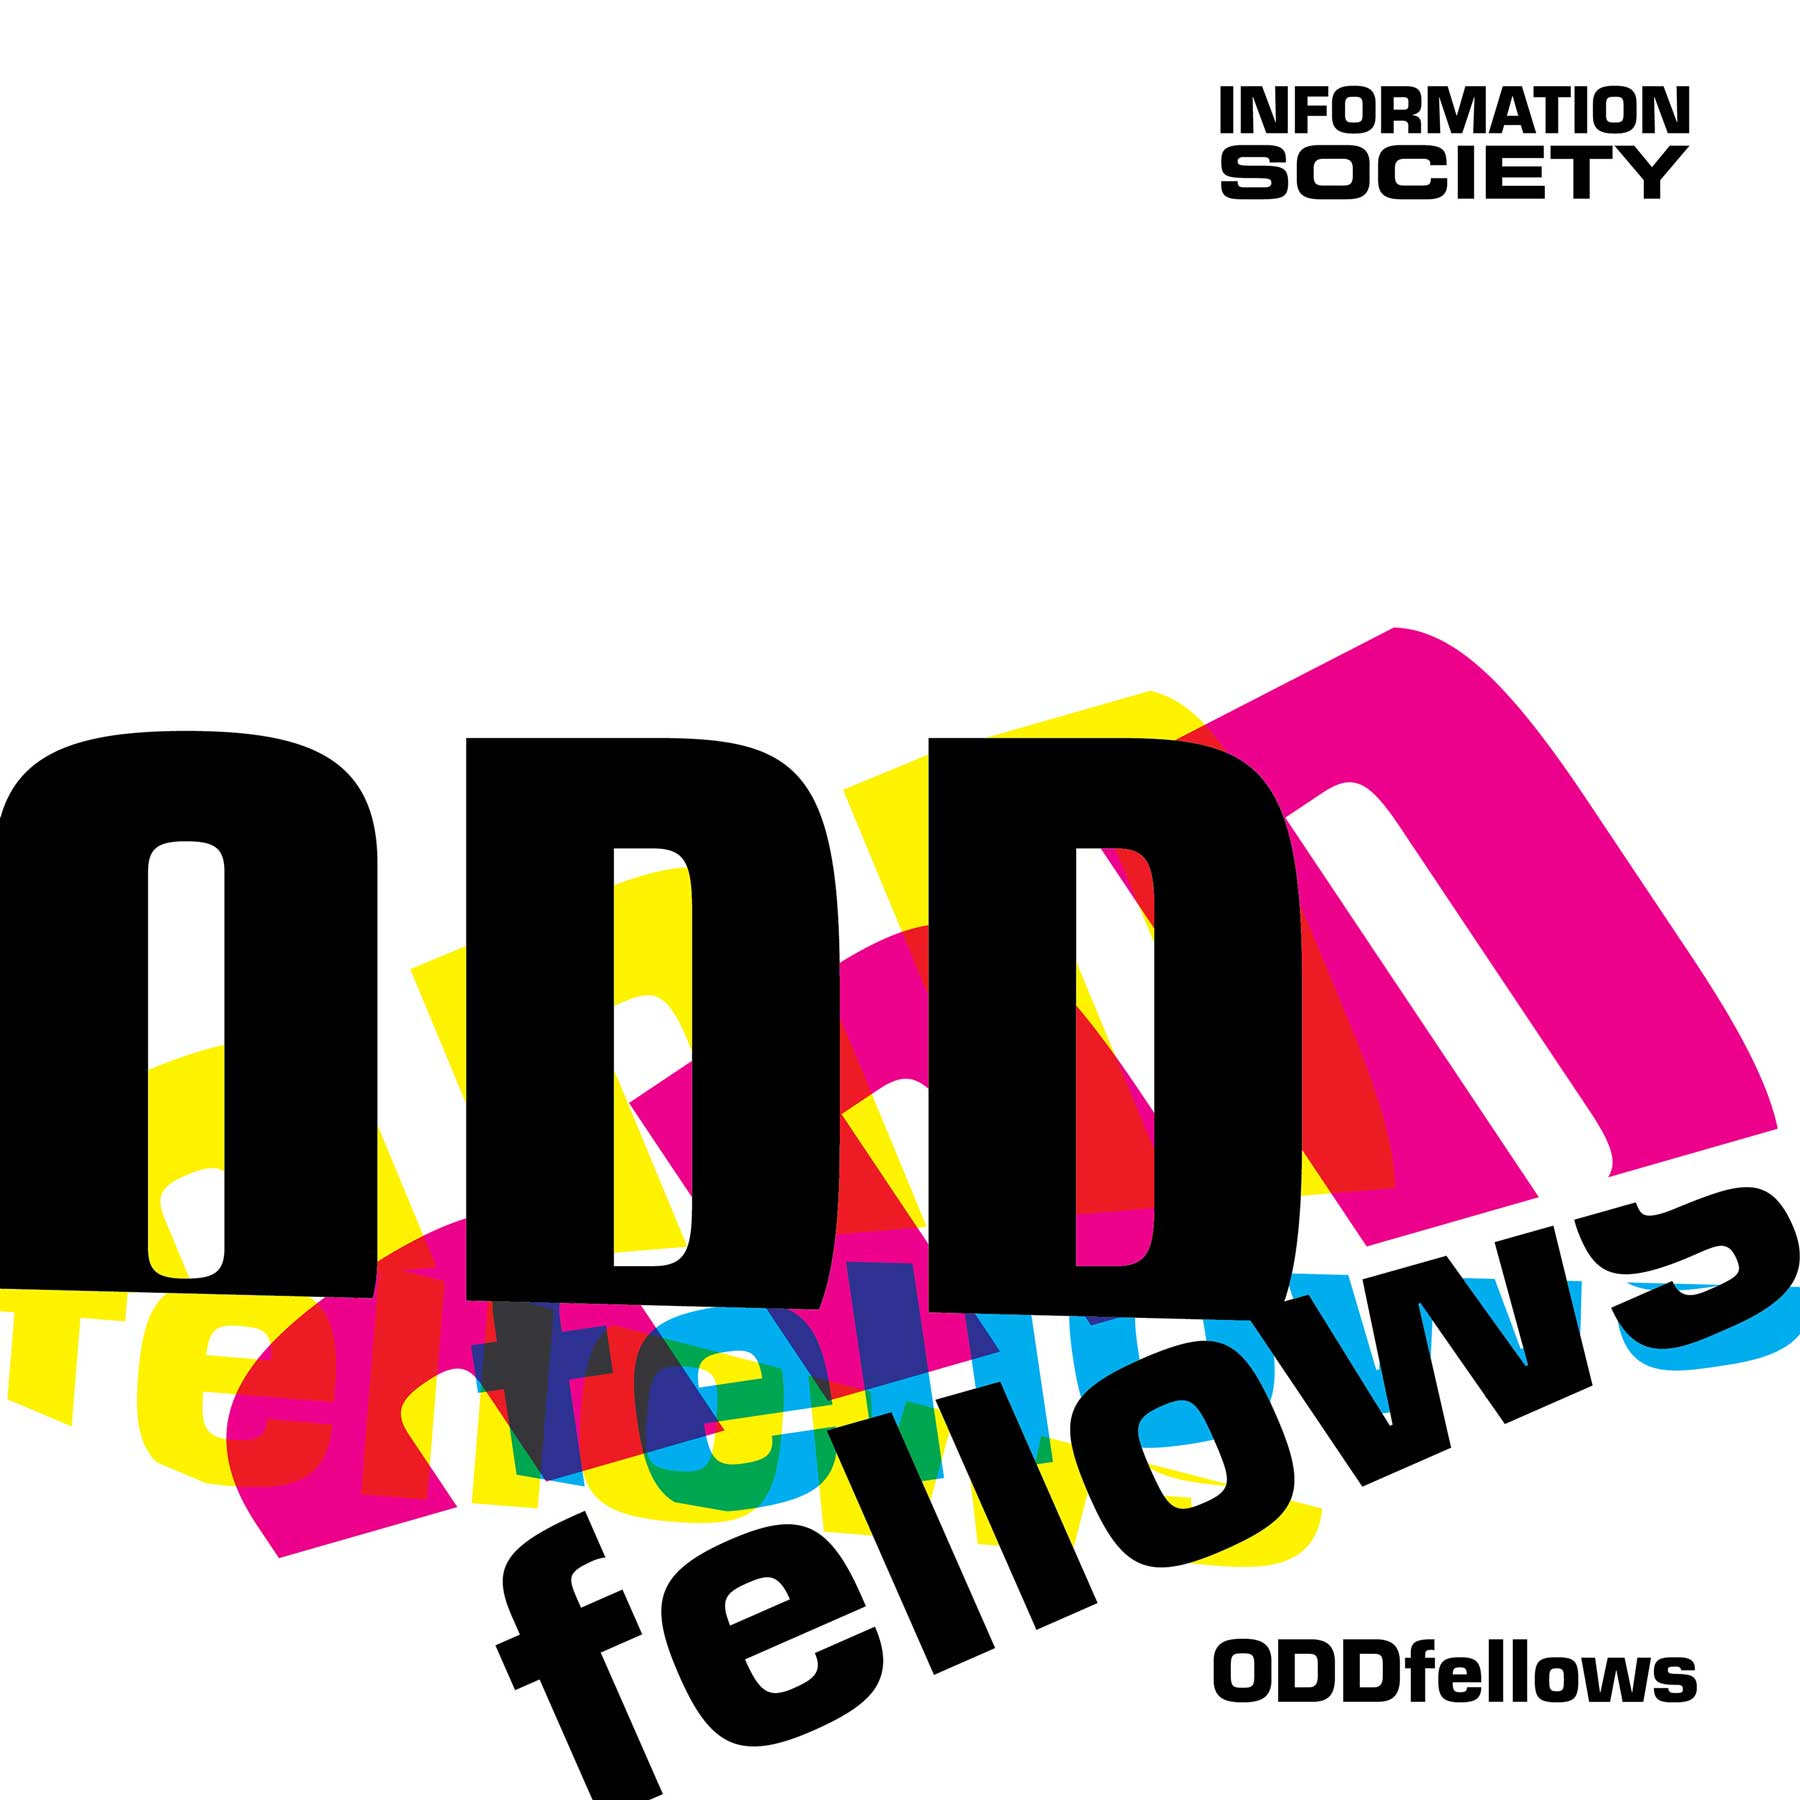 Information Society - ODDfellows - Information Society - ODDfellows